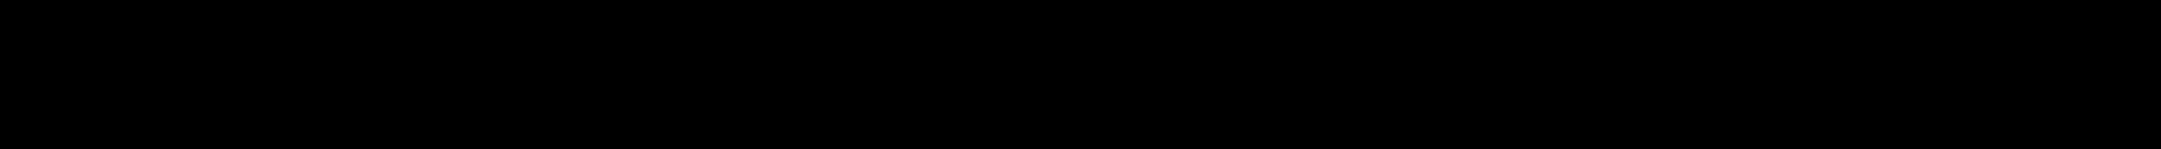 MINT Eyelash & Relaxation Aesthe 神奈川県横浜市都筑区茅ヶ崎中央13-7-1F